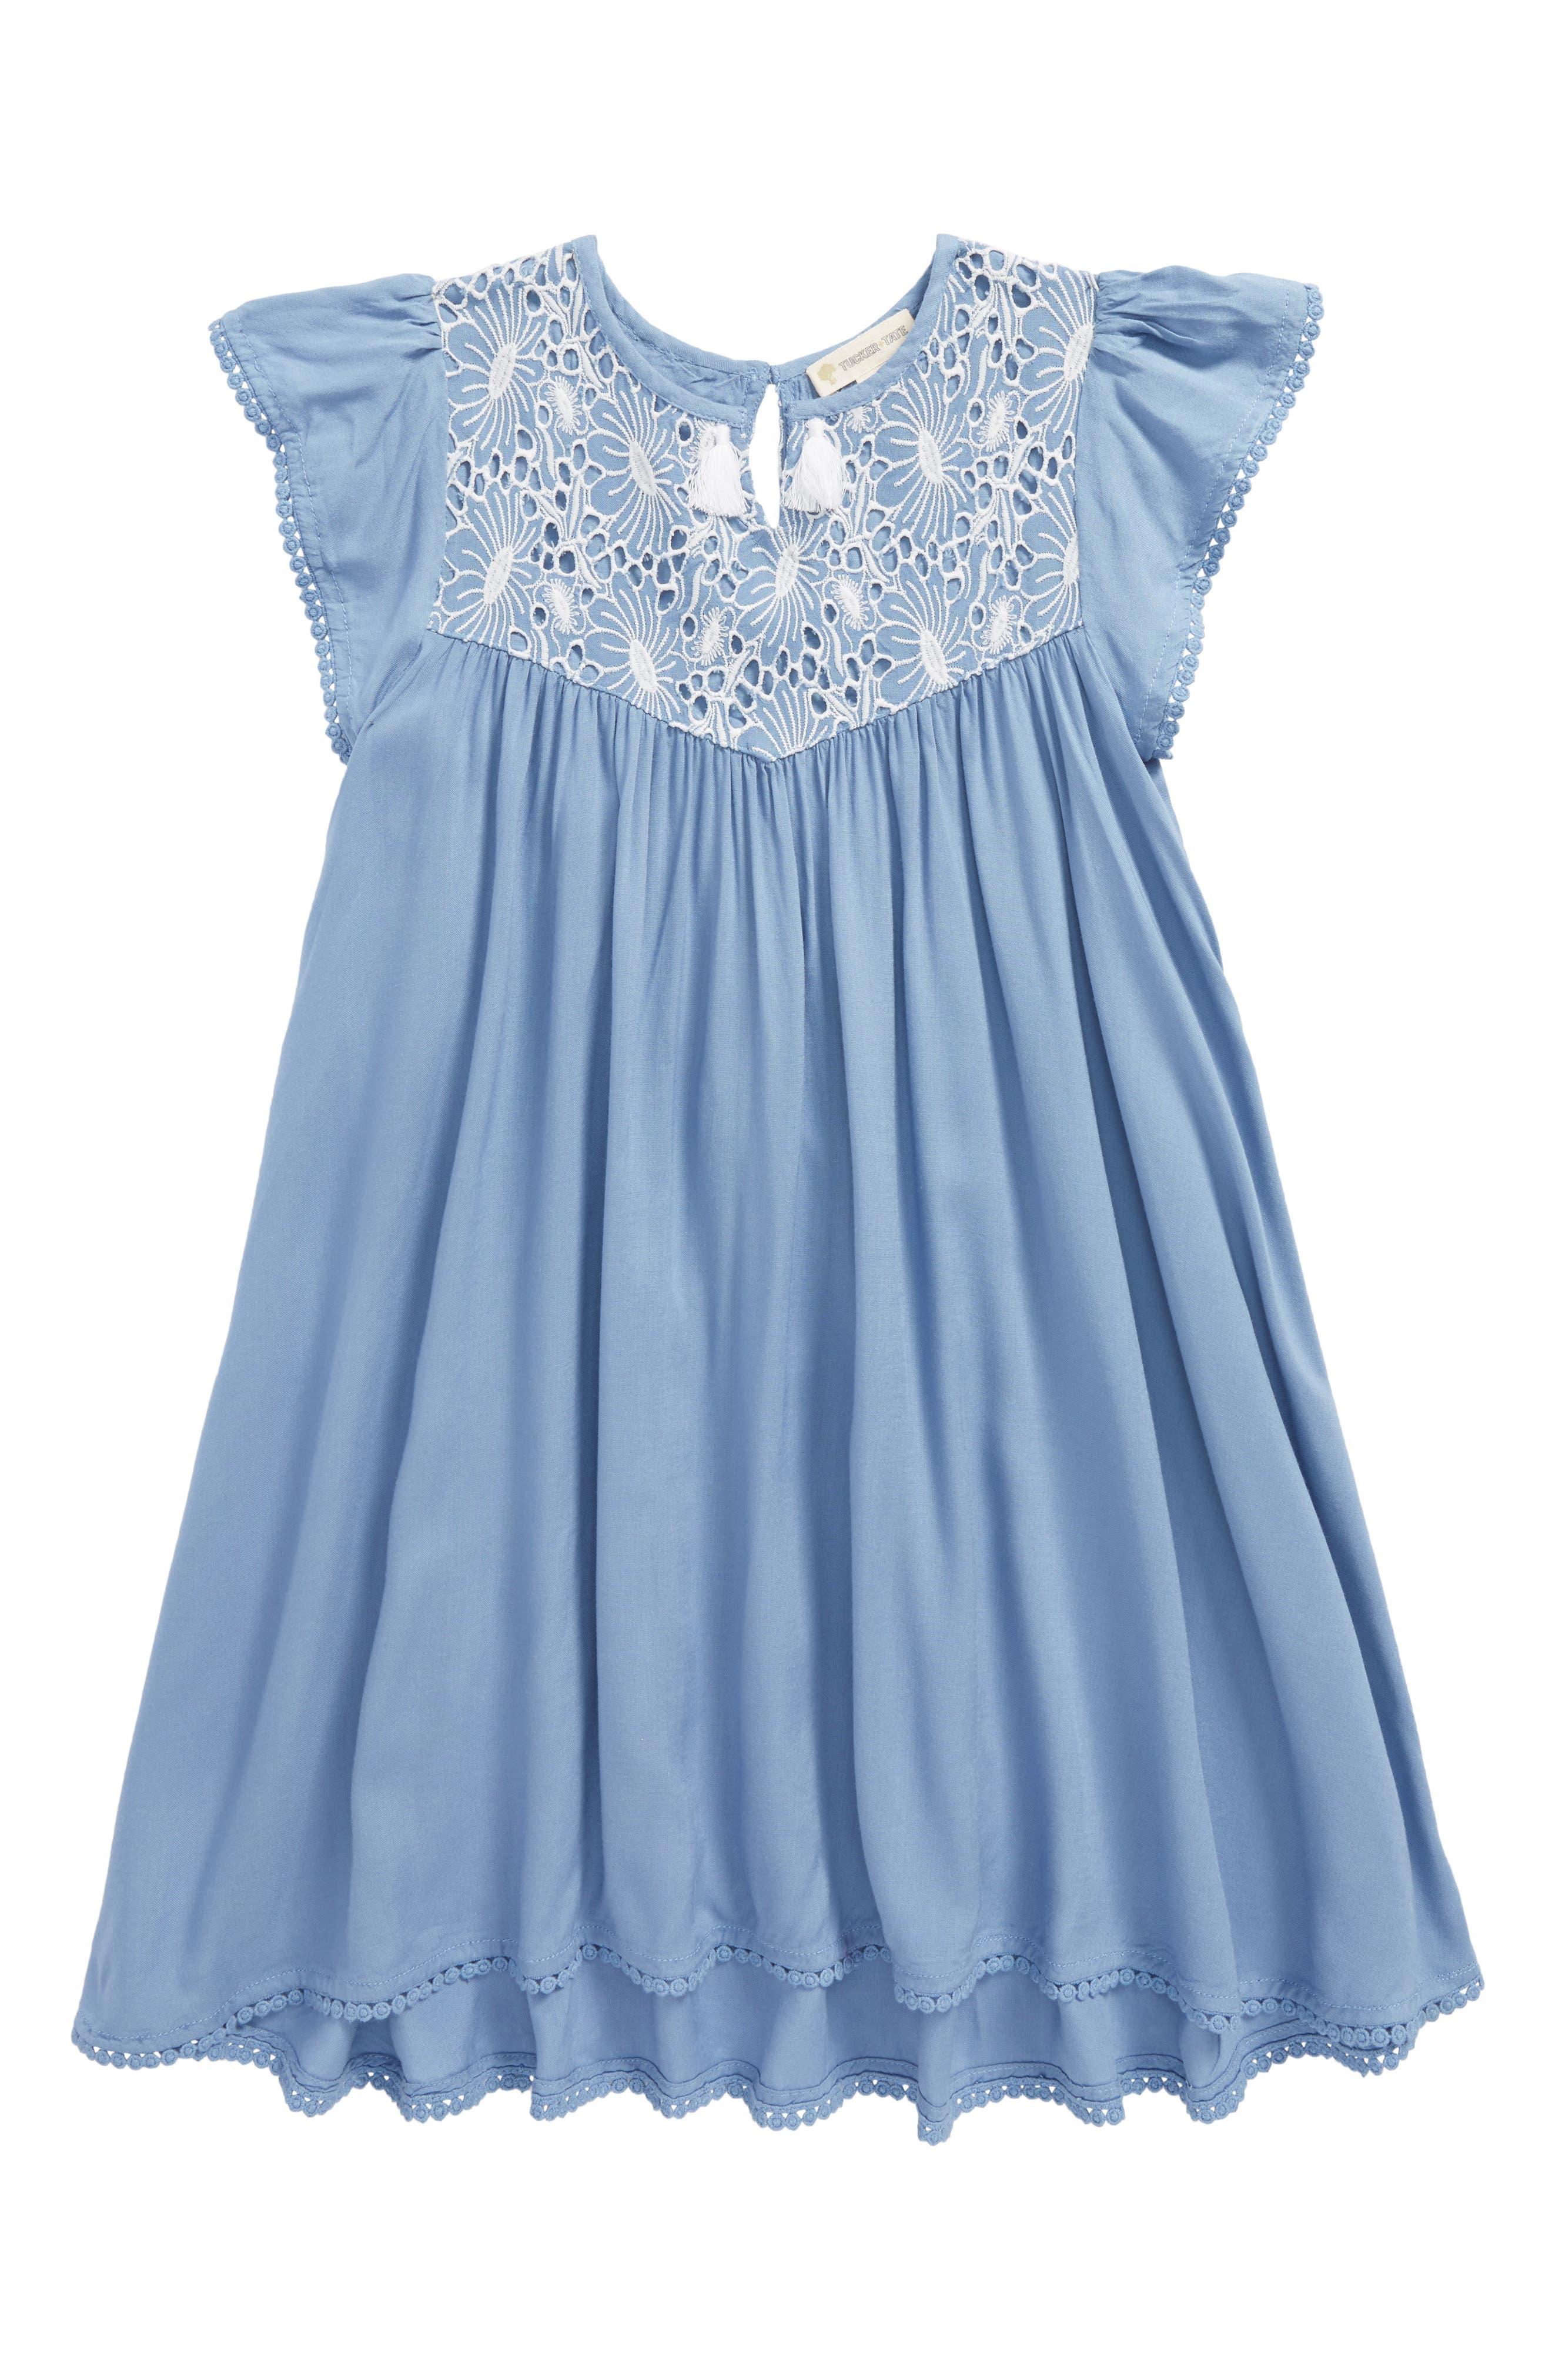 TUCKER + TATE Embroidered Tassel Dress, Main, color, BLUE